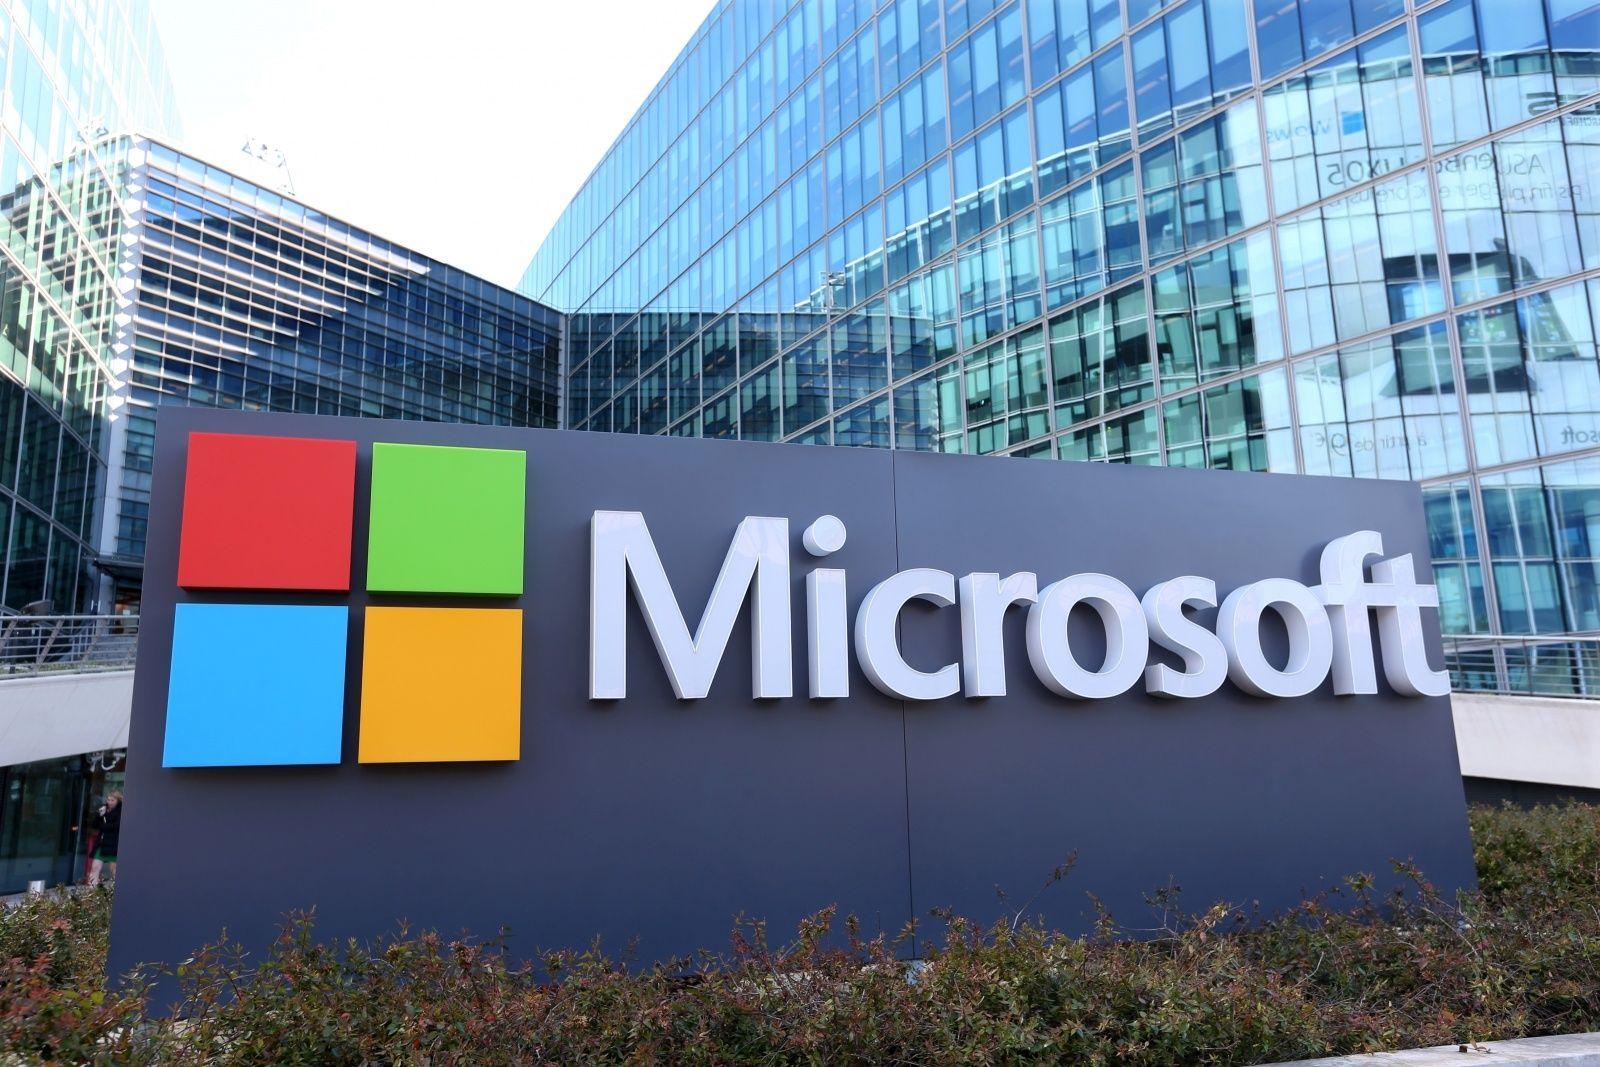 Wedbush повысил прогнозную цену акций Microsoft- Kapital.kz